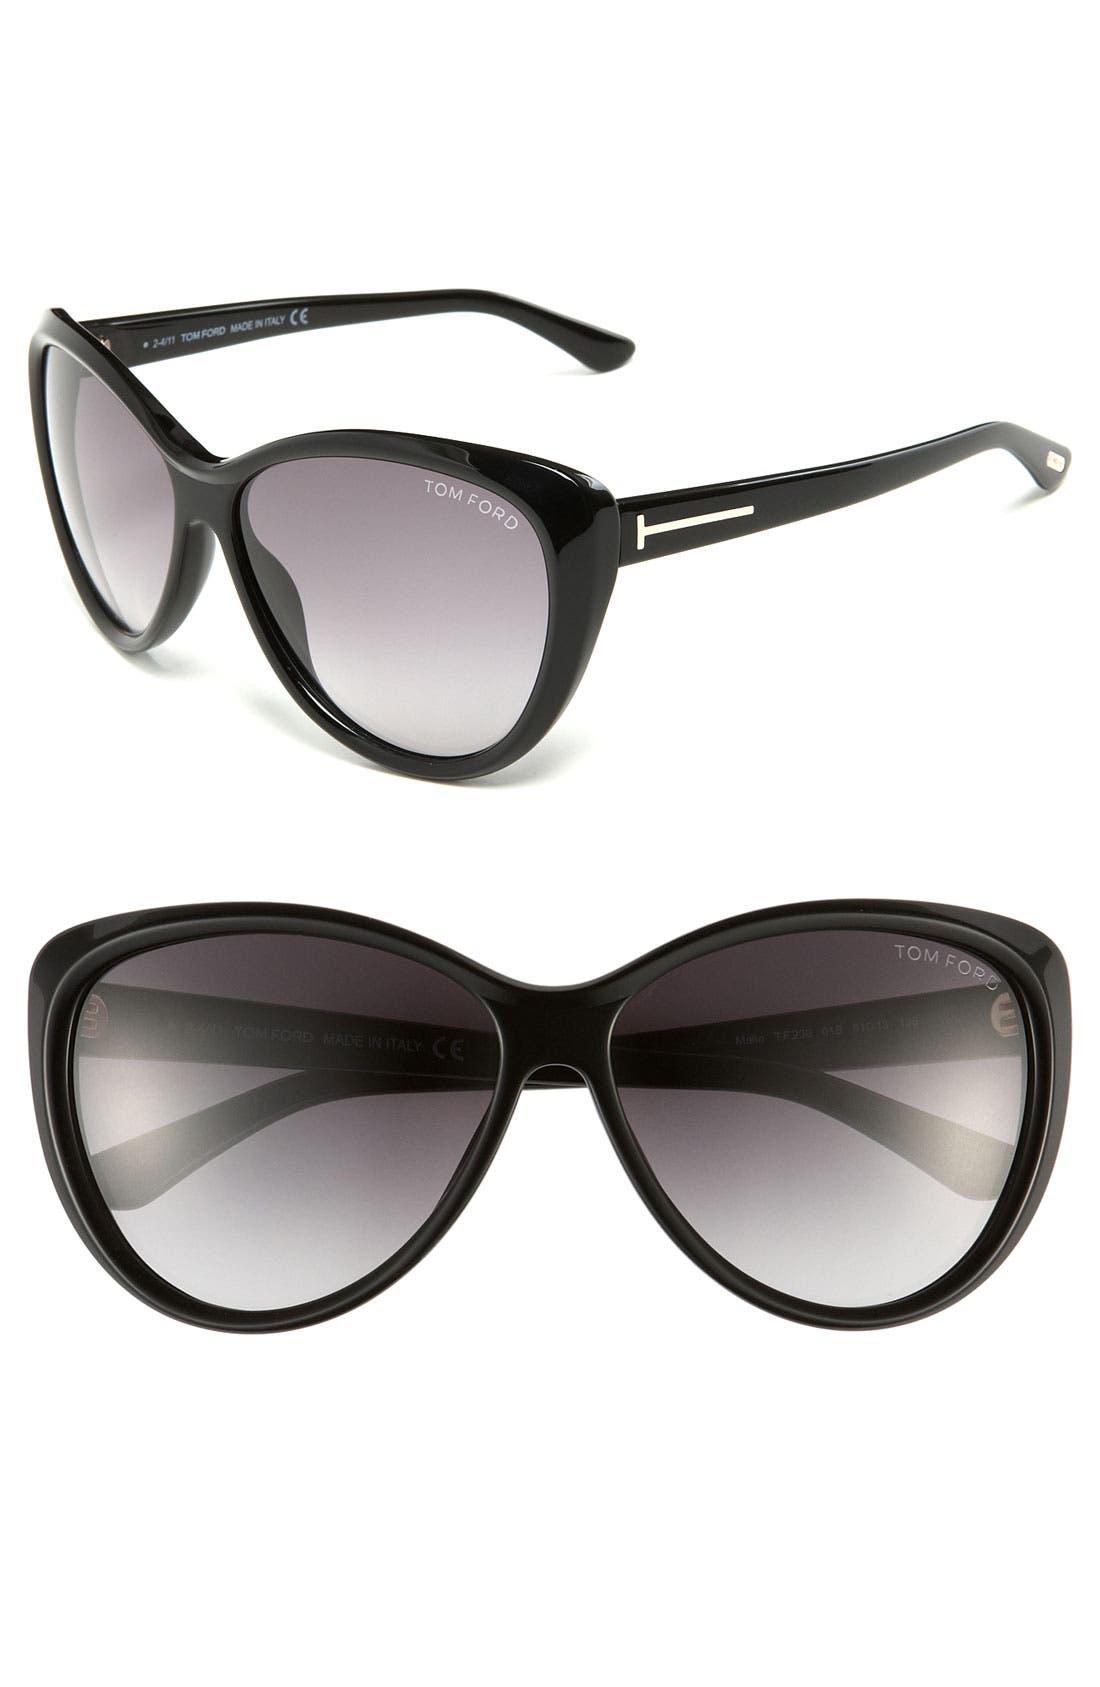 Main Image - Tom Ford 61mm Cat Eye Sunglasses